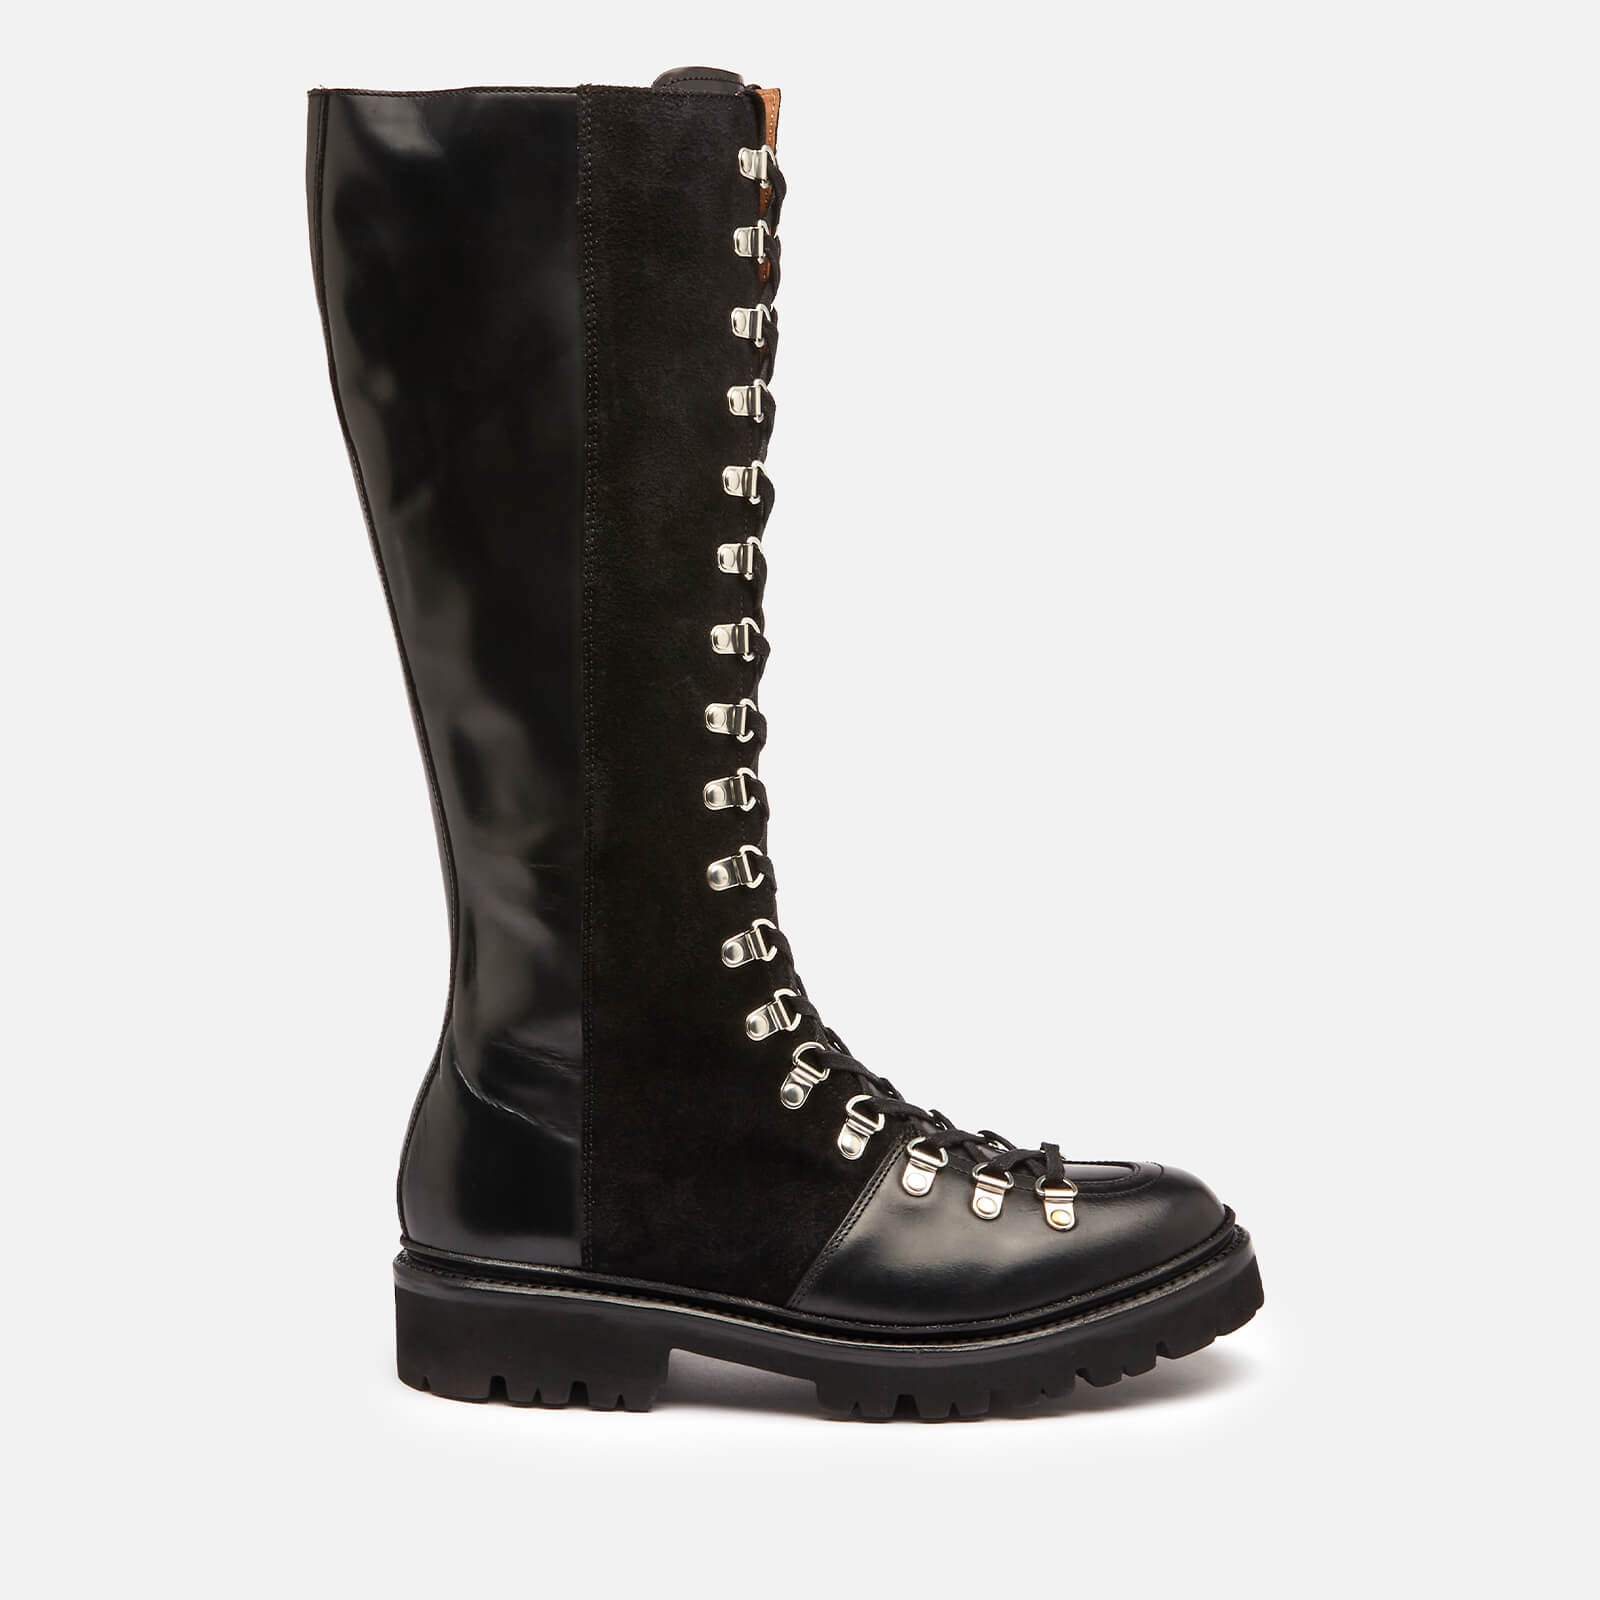 Grenson Women's Nanette Hi Leather/Suede Boots - Black - Uk 3